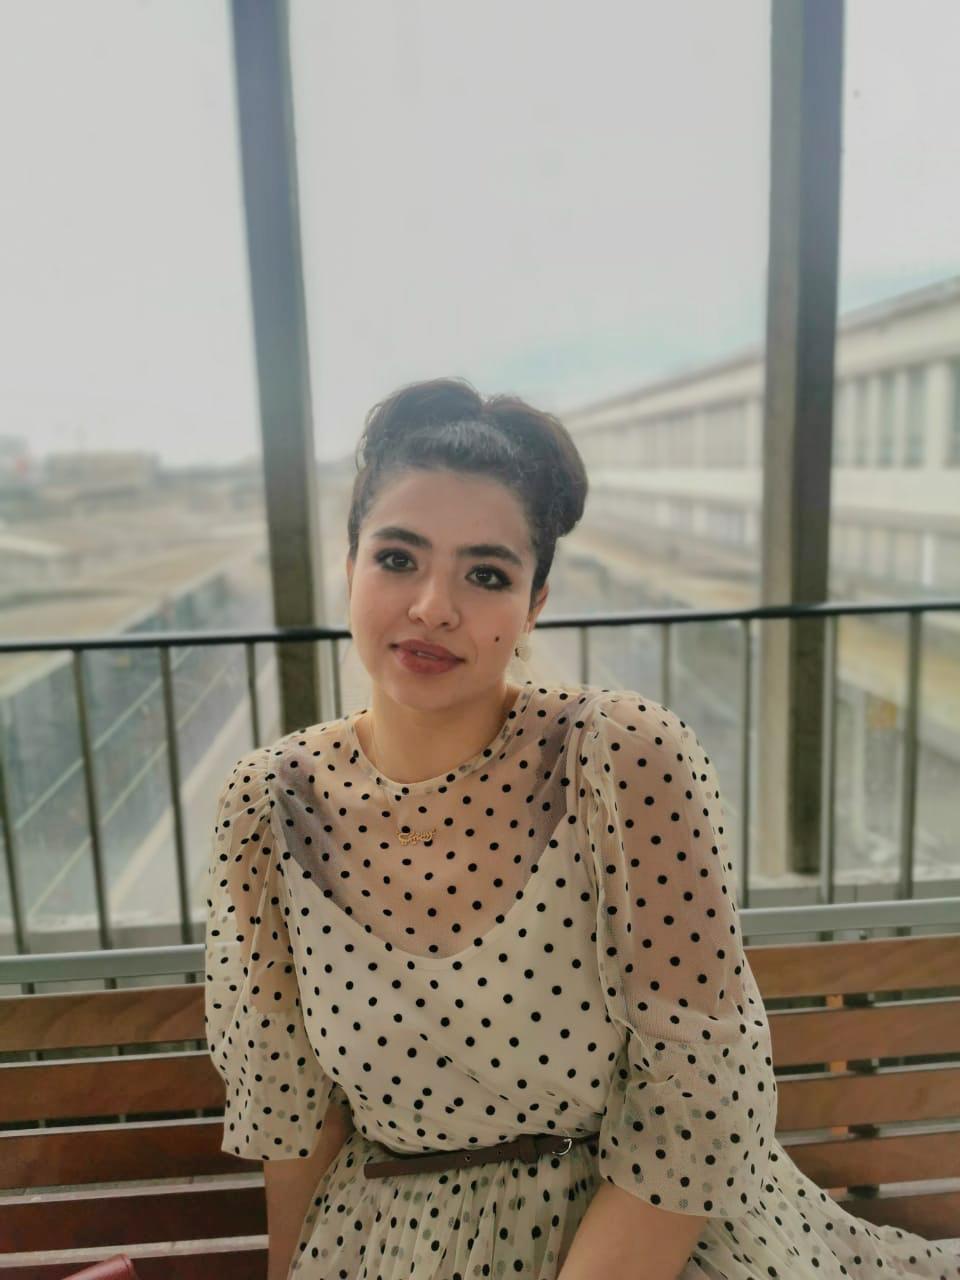 Amina Nour Yassine